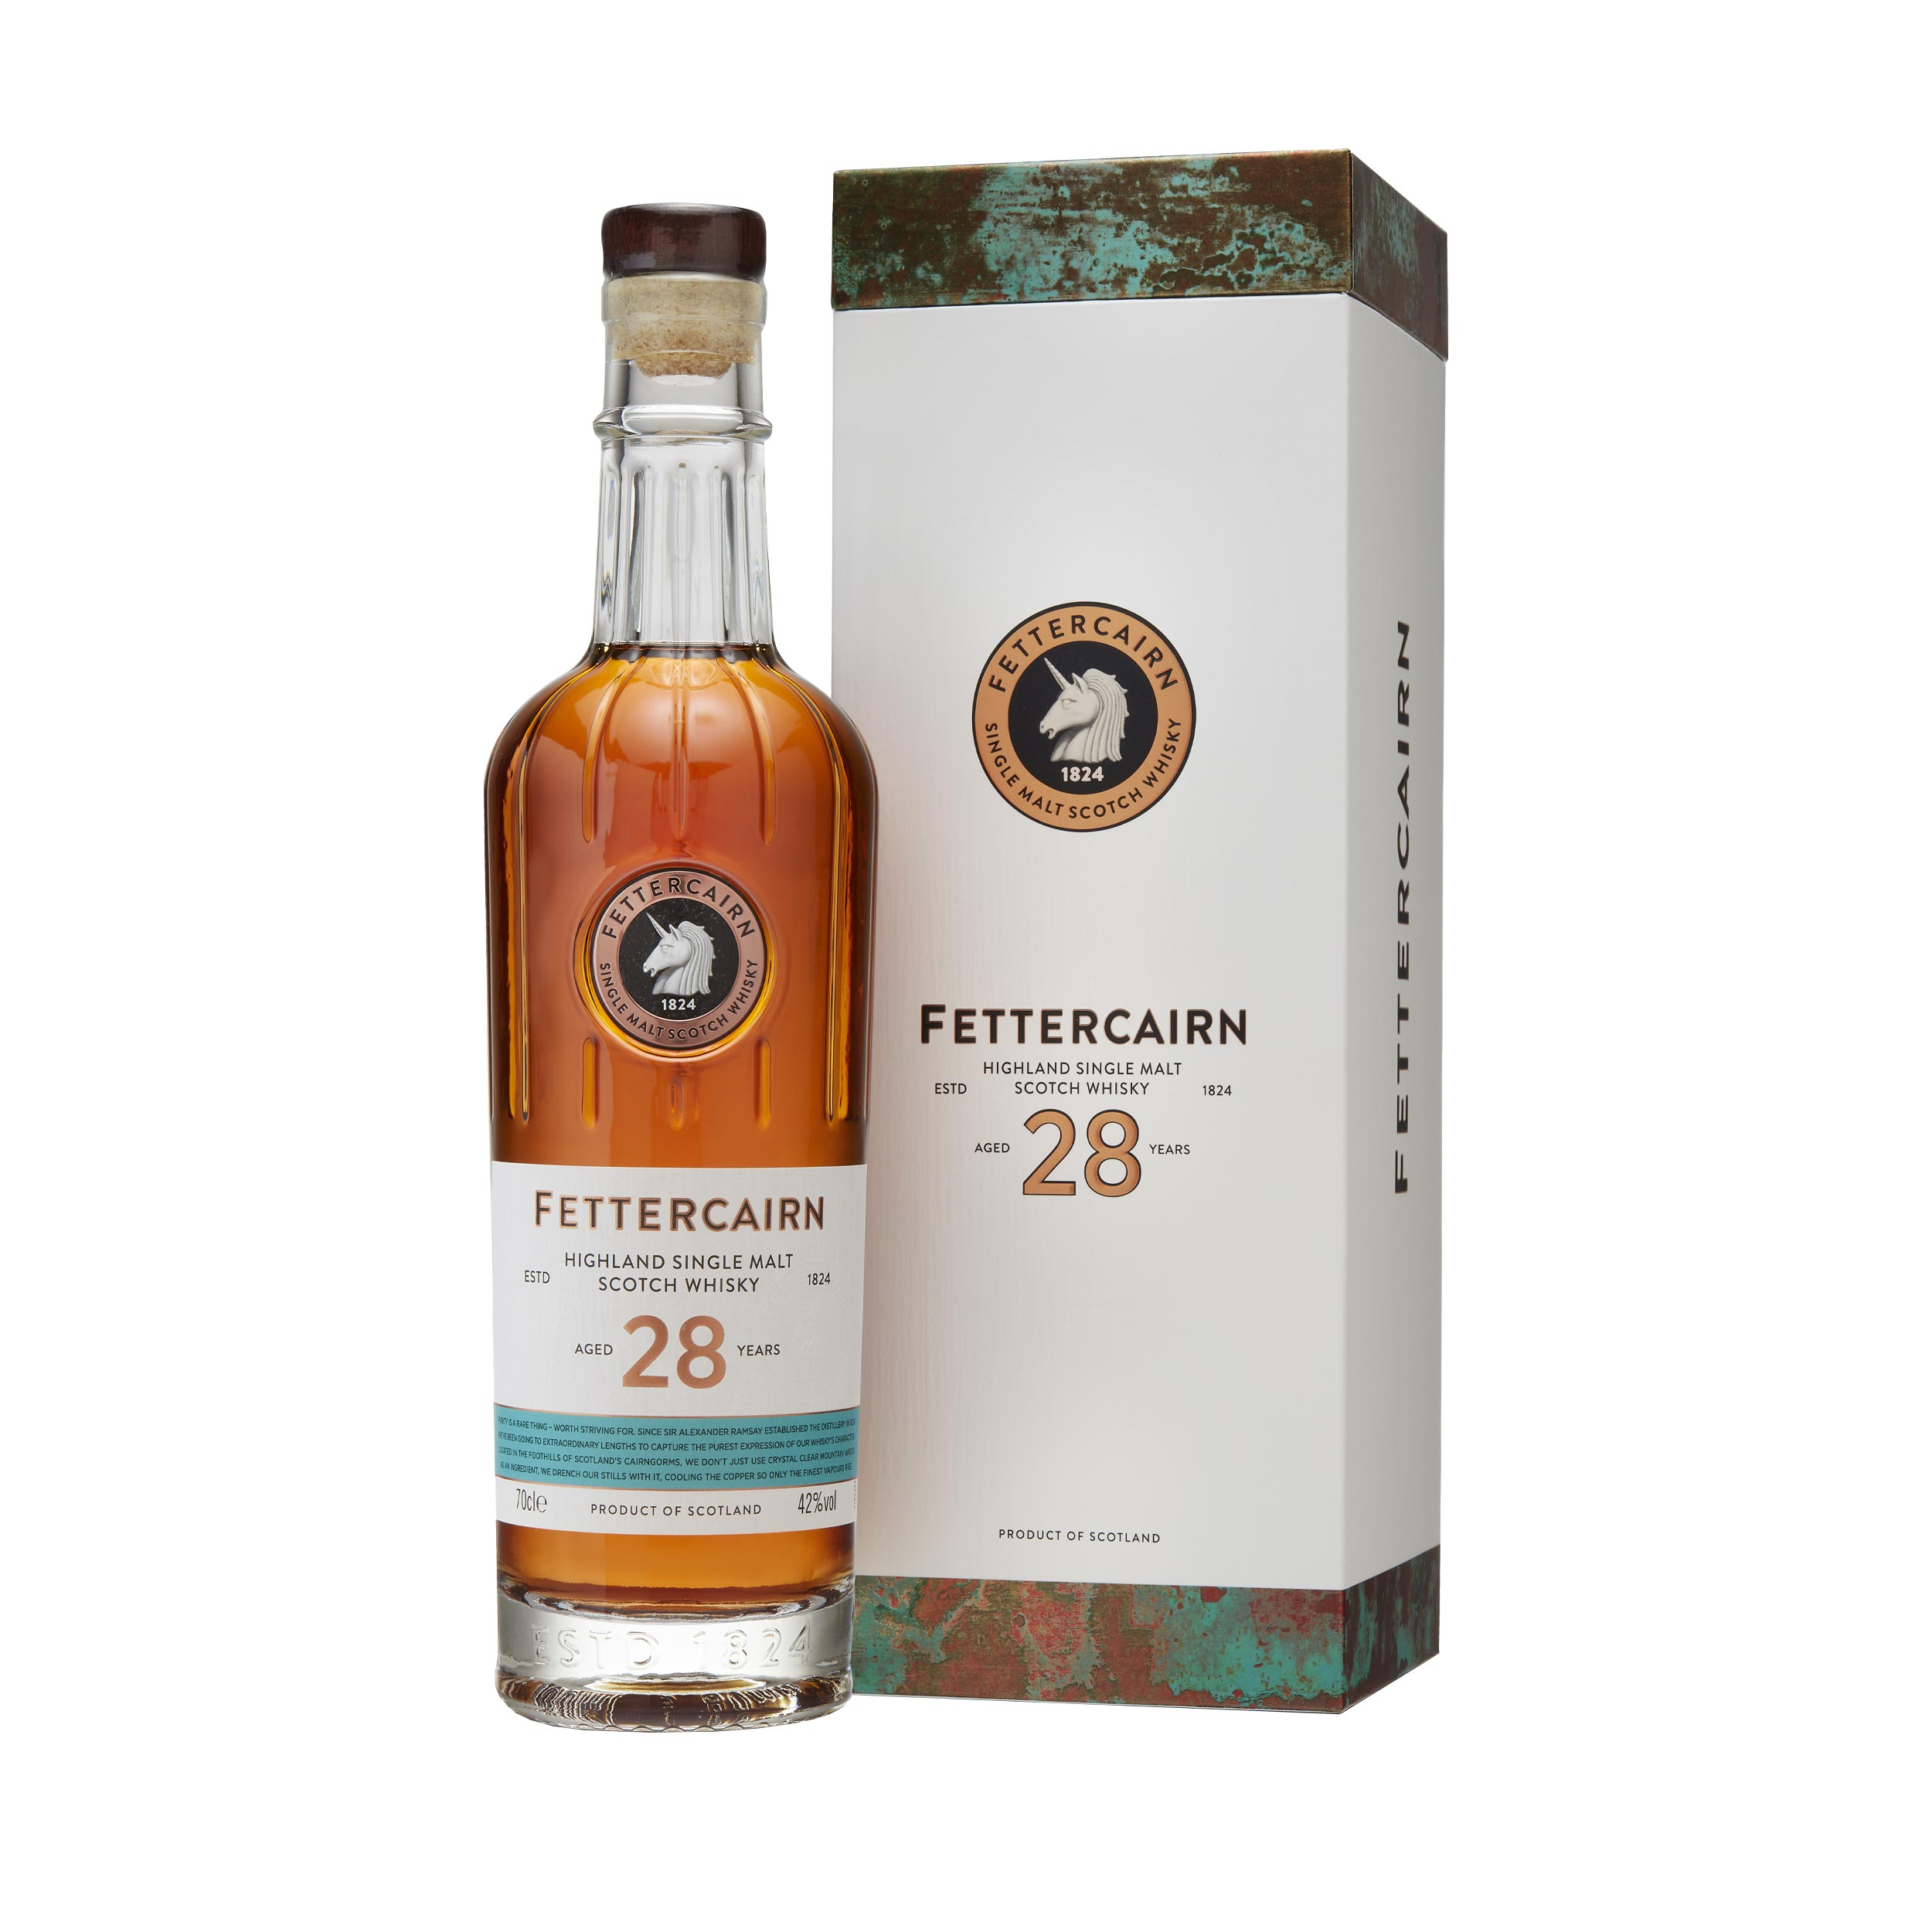 Fettercairn 28 Year Old Highland Single Malt Scotch Whisky 70cl